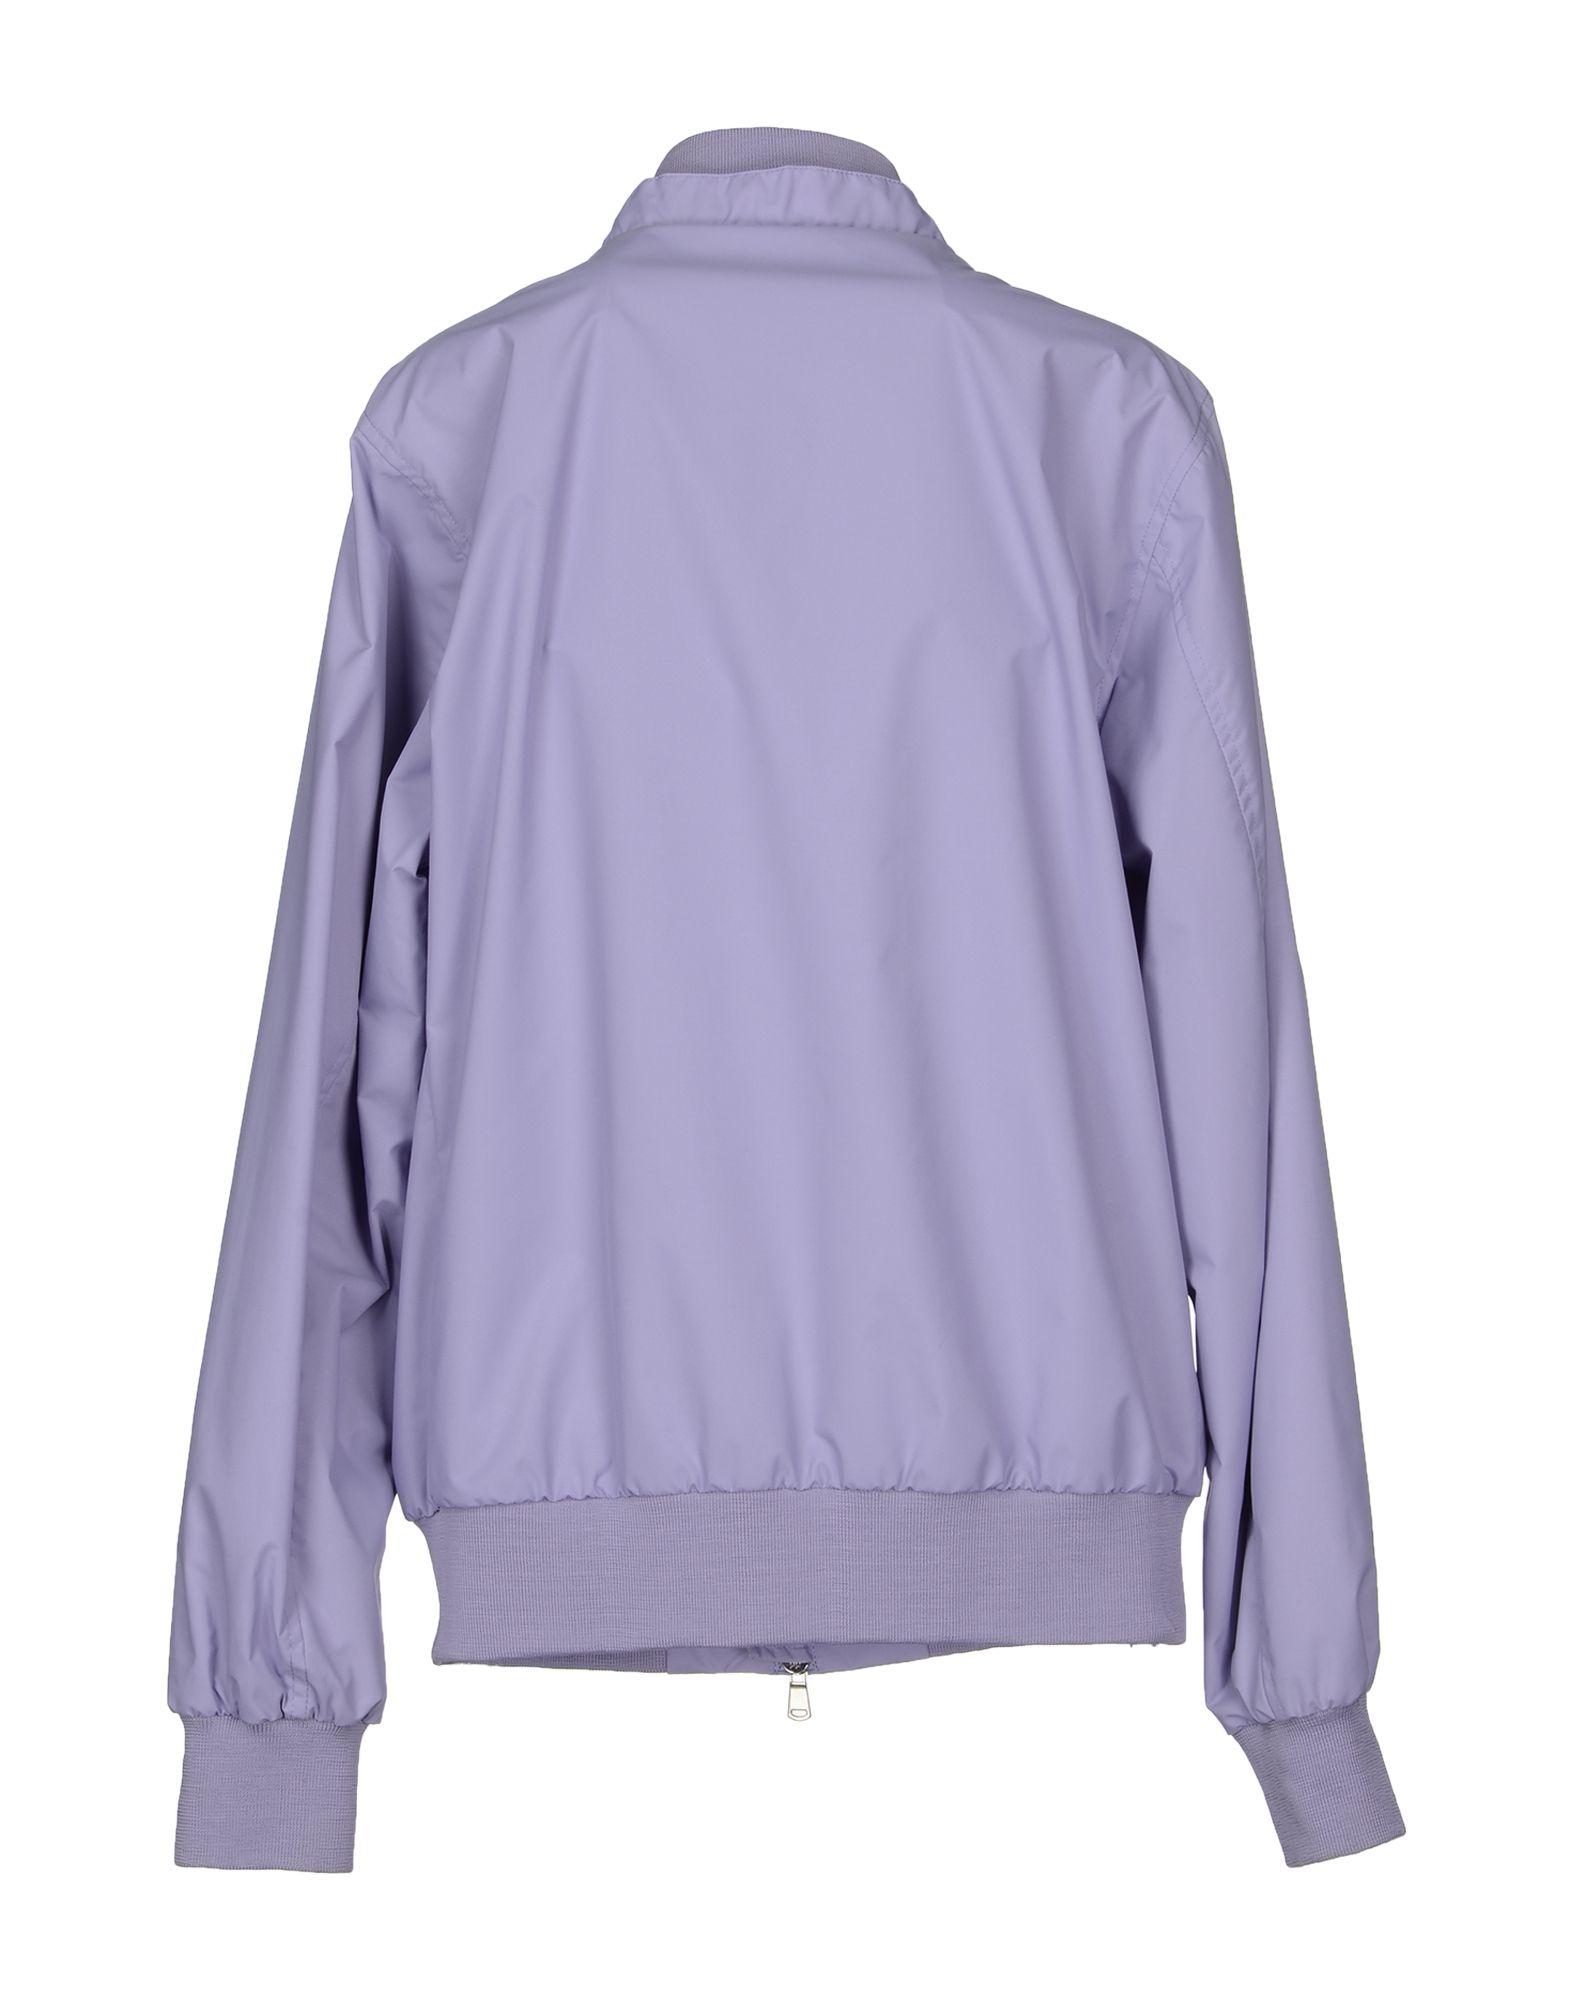 lyst north sails jacket in purple. Black Bedroom Furniture Sets. Home Design Ideas